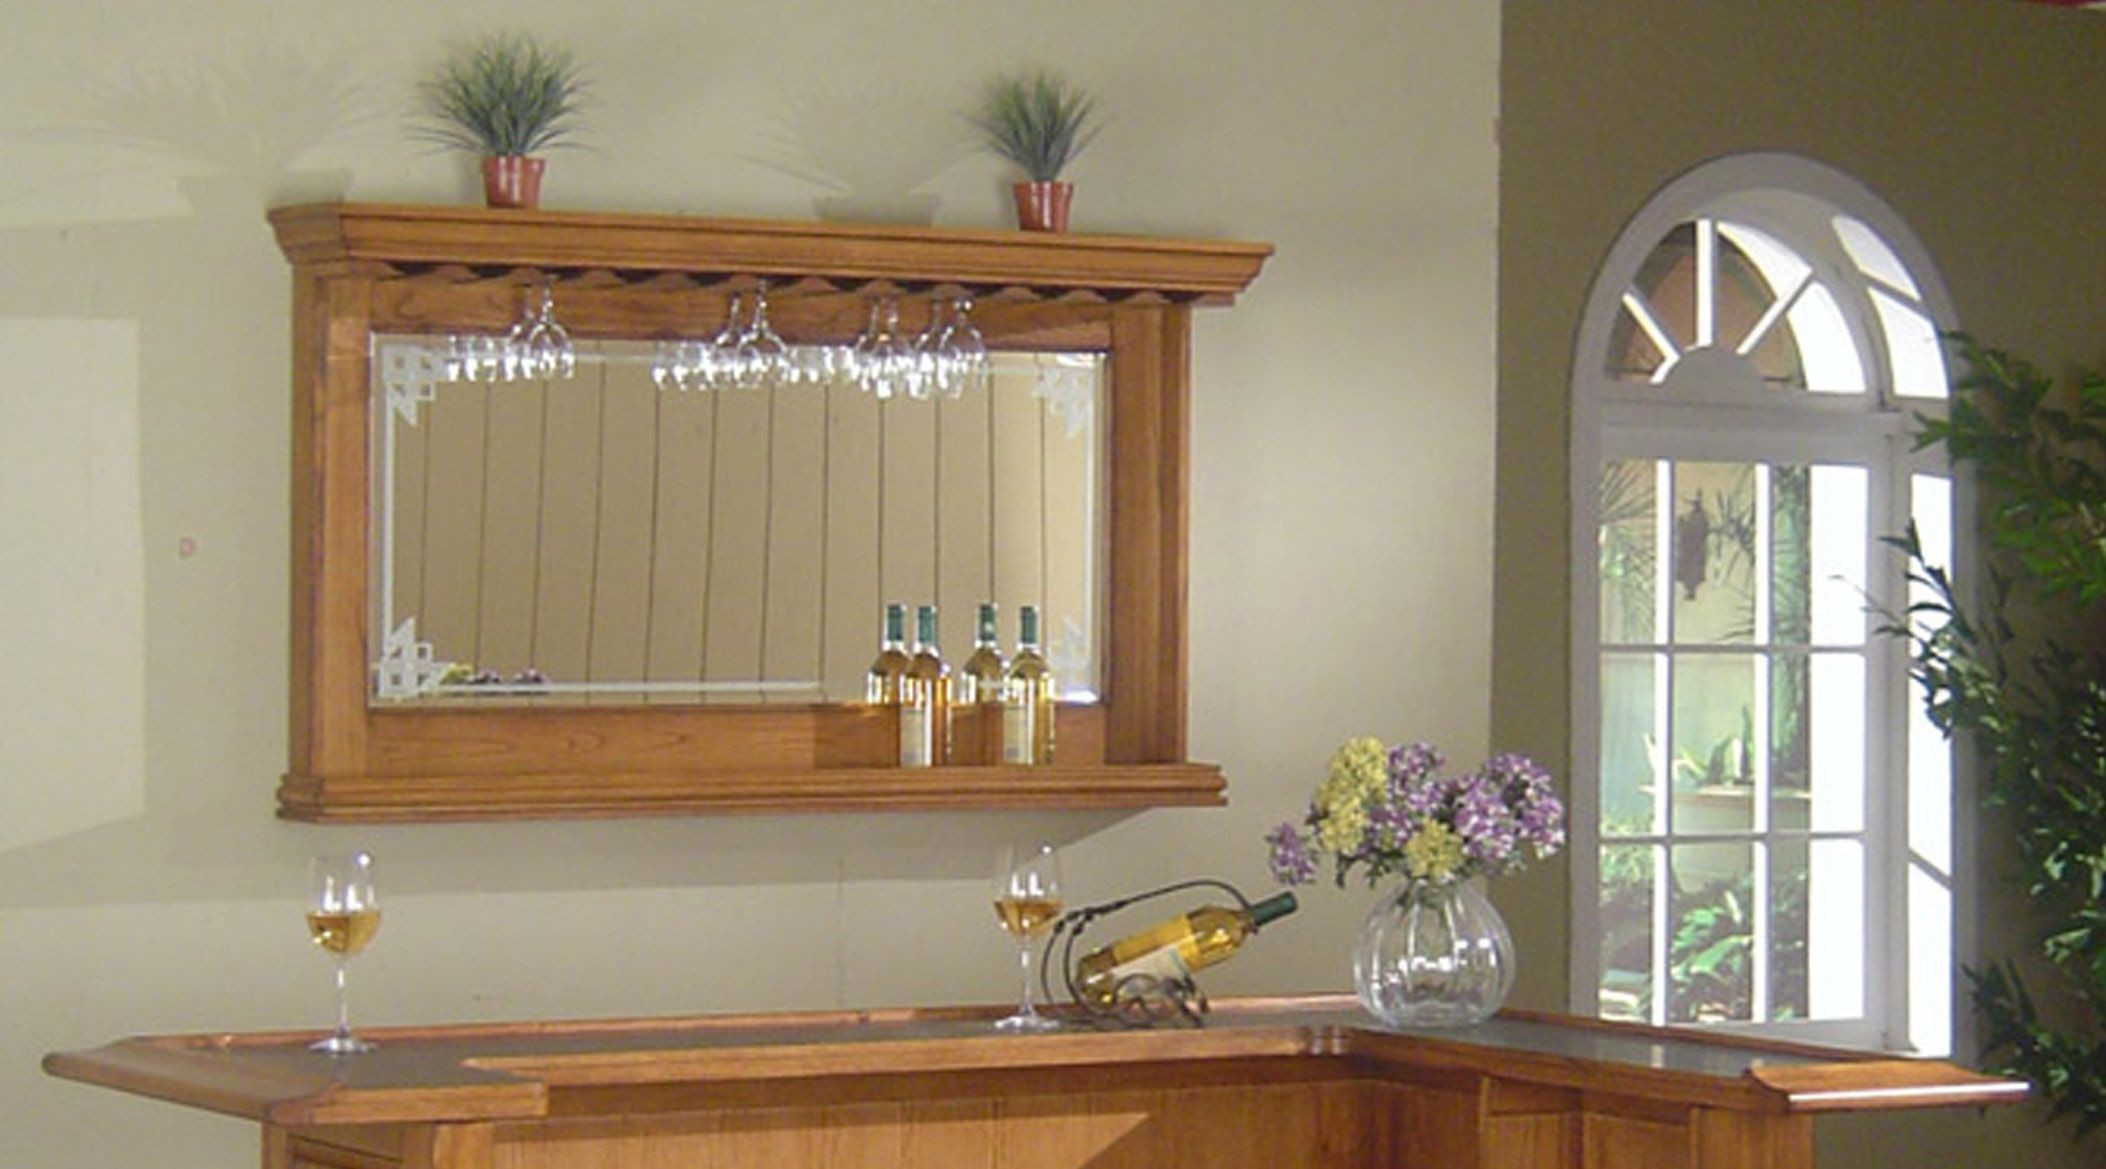 Oak bar mirrors with shelves - Burnished Oak Bar Mirror